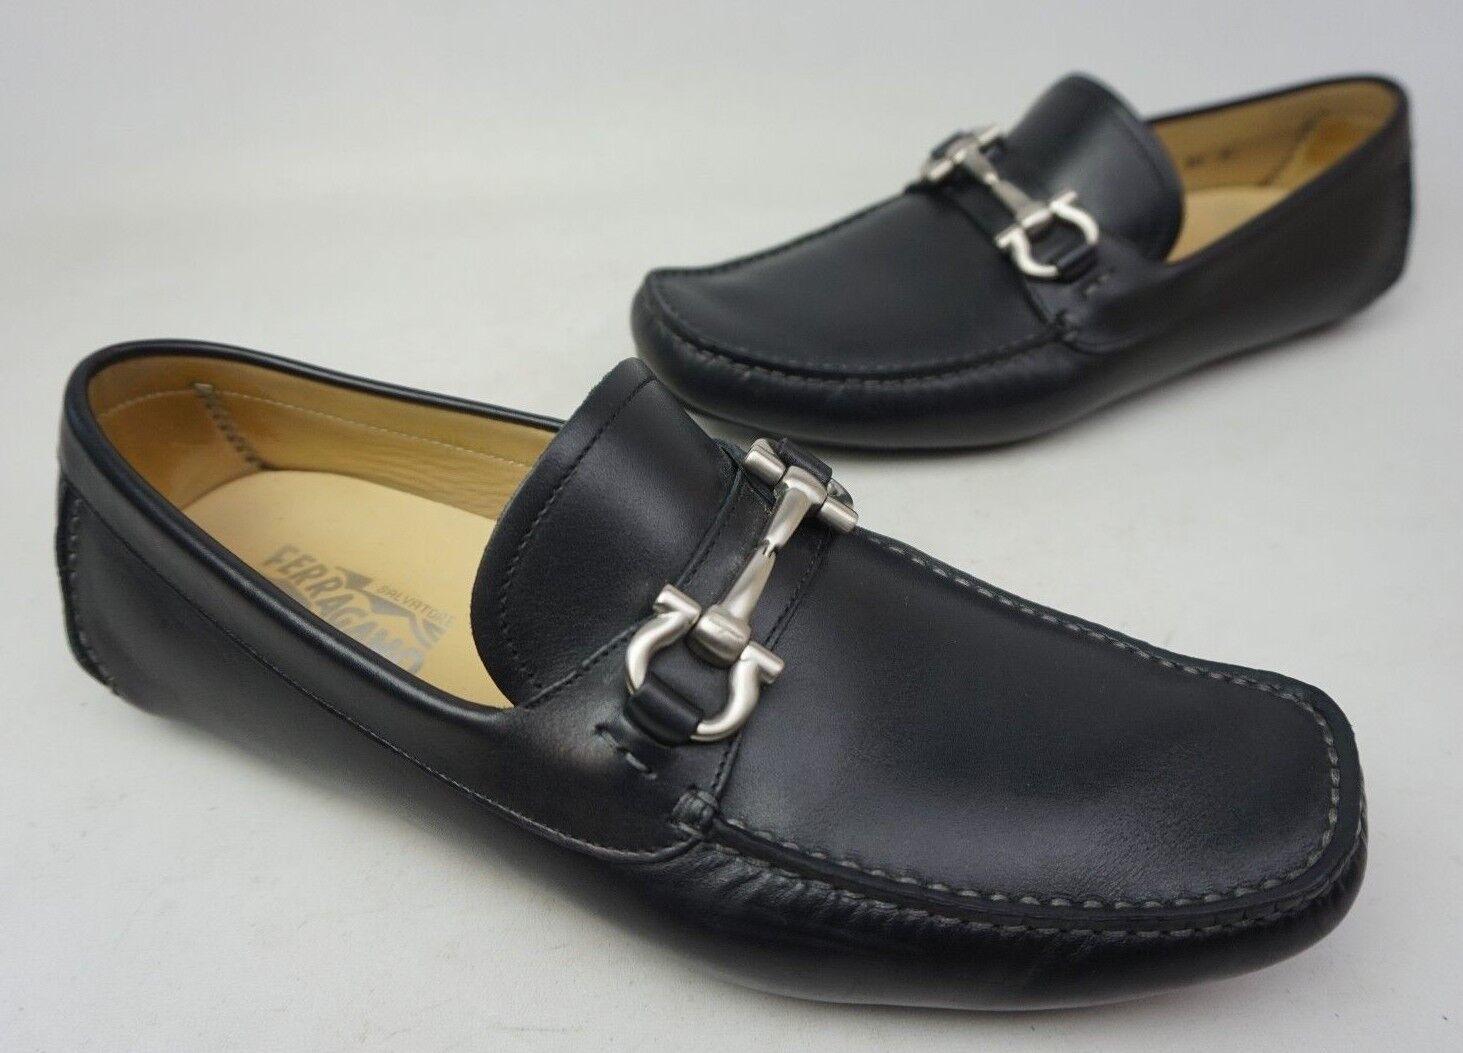 Salvatore Ferragamo Parigi Driving Black Shoes Silver Bit Loafers Size 8.5 EE 2E